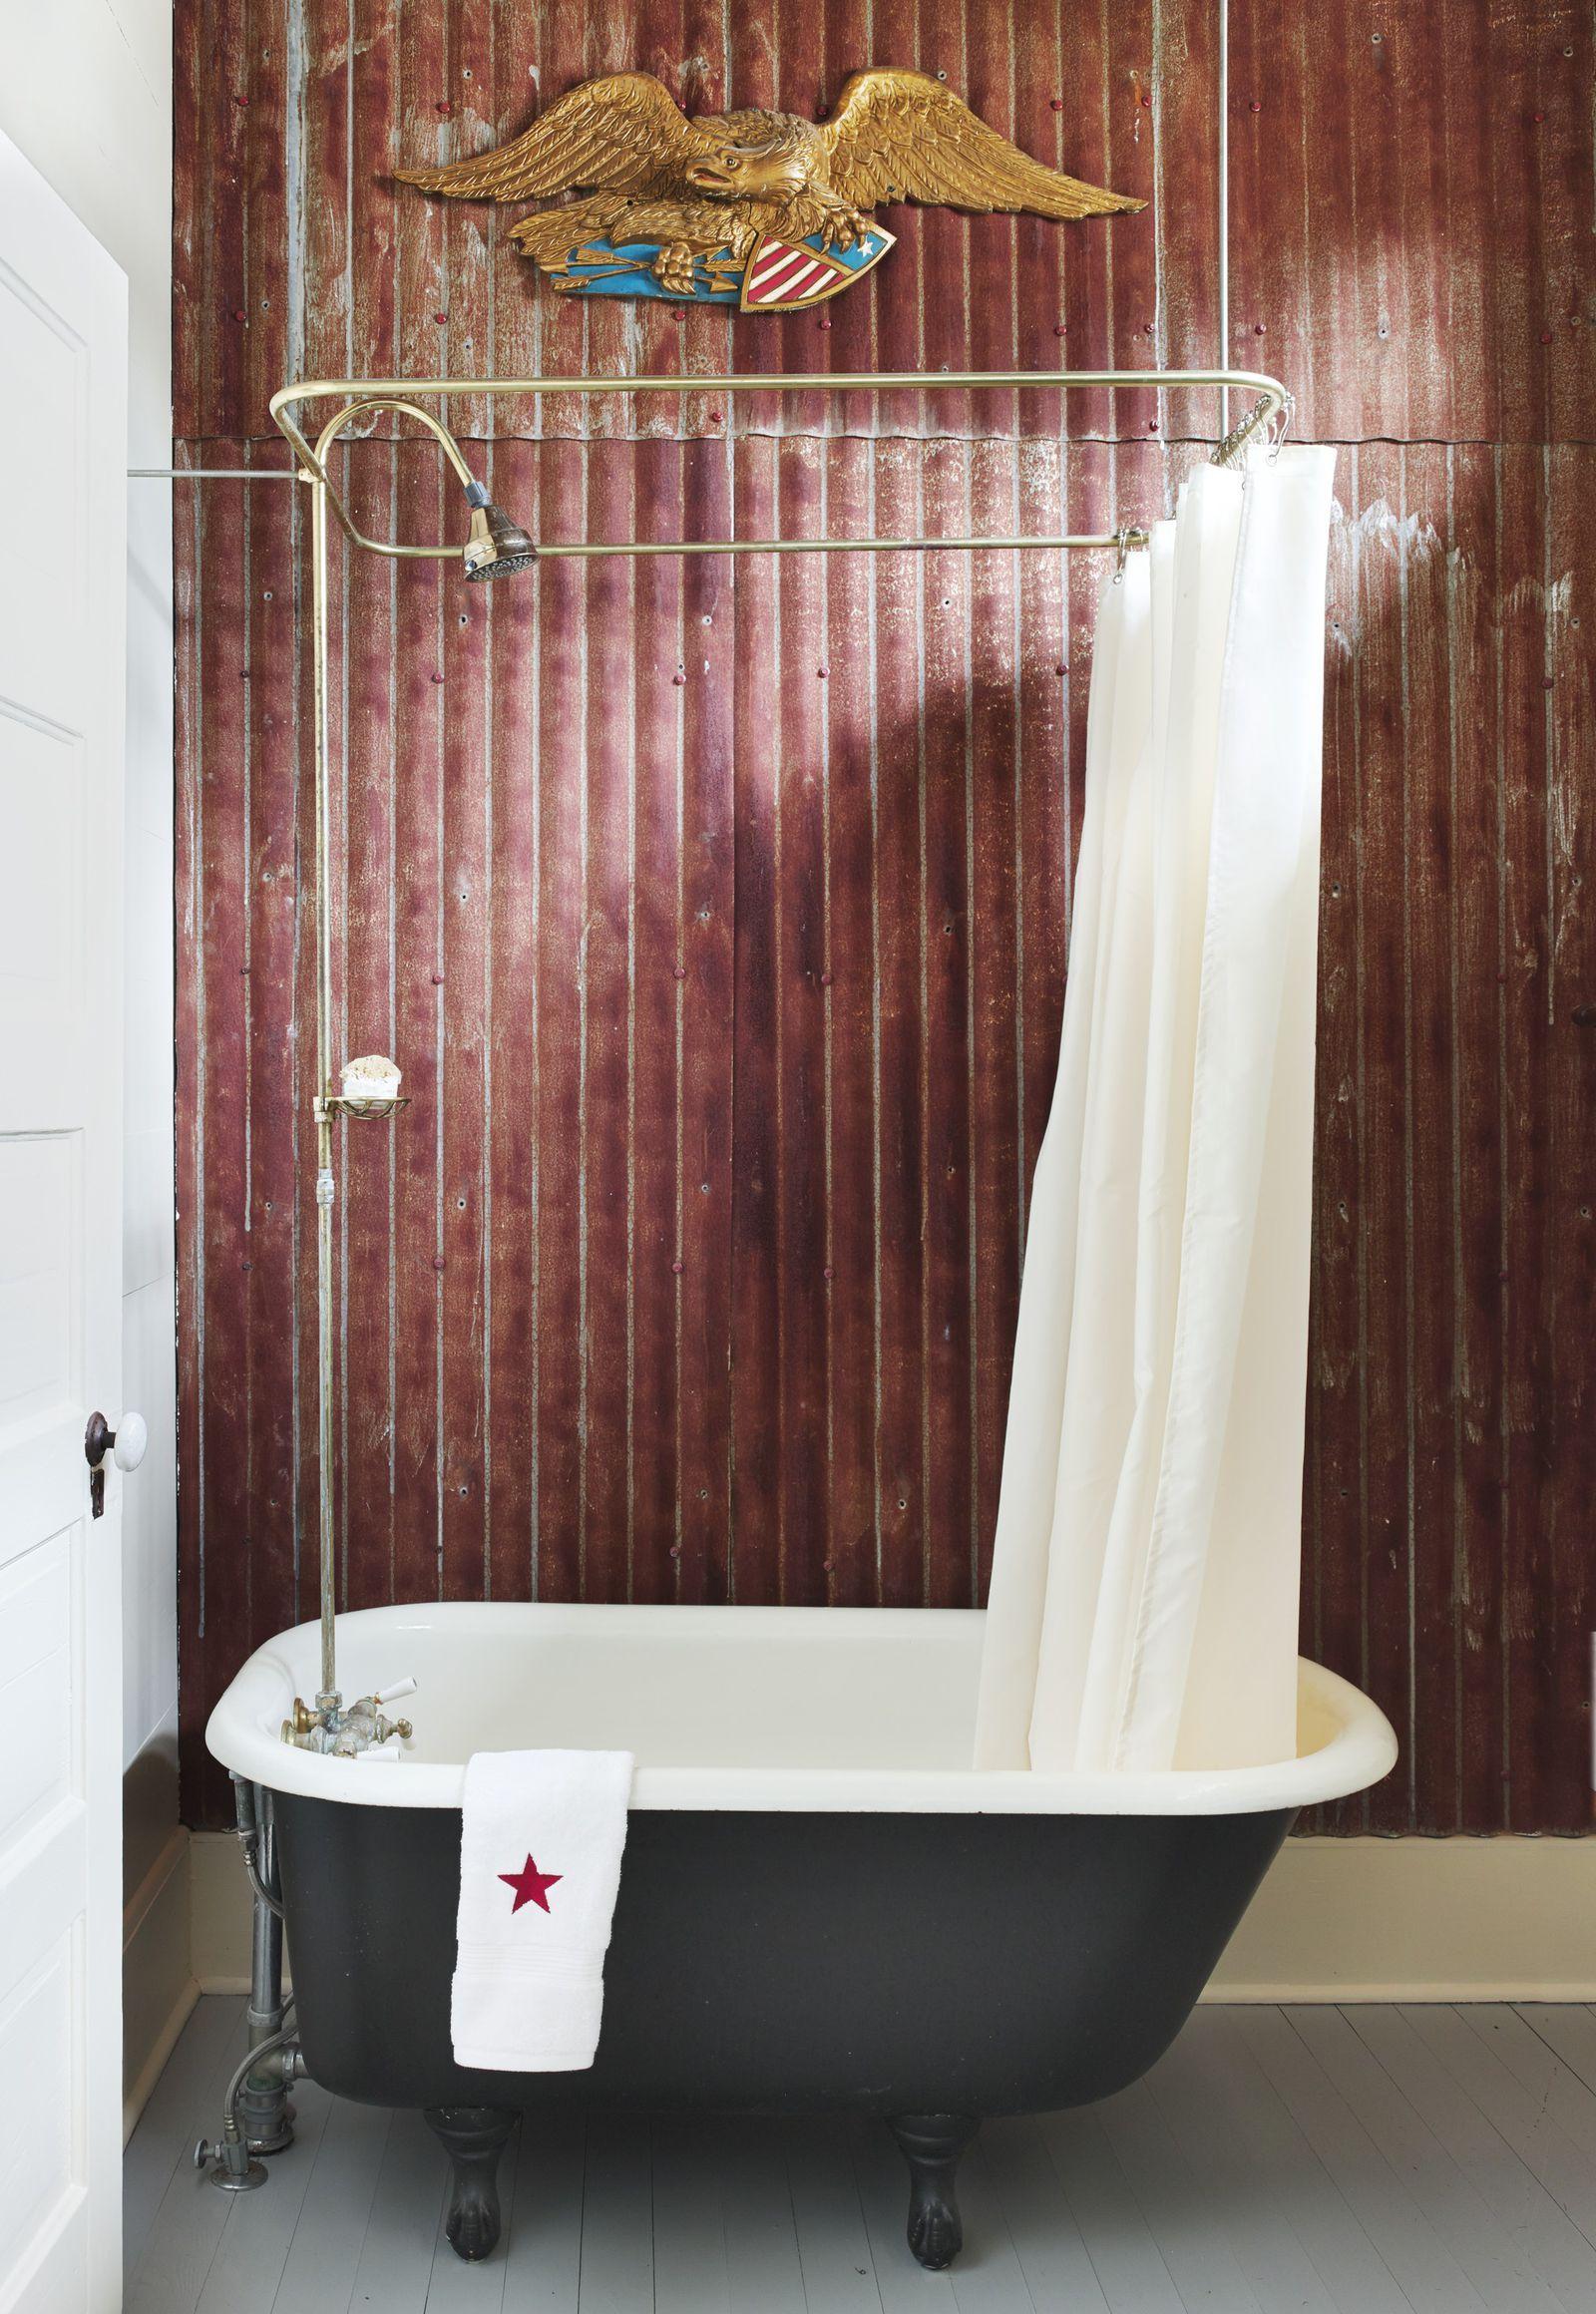 25 Creative Clawfoot Tub Ideas for Every Bathroom ...